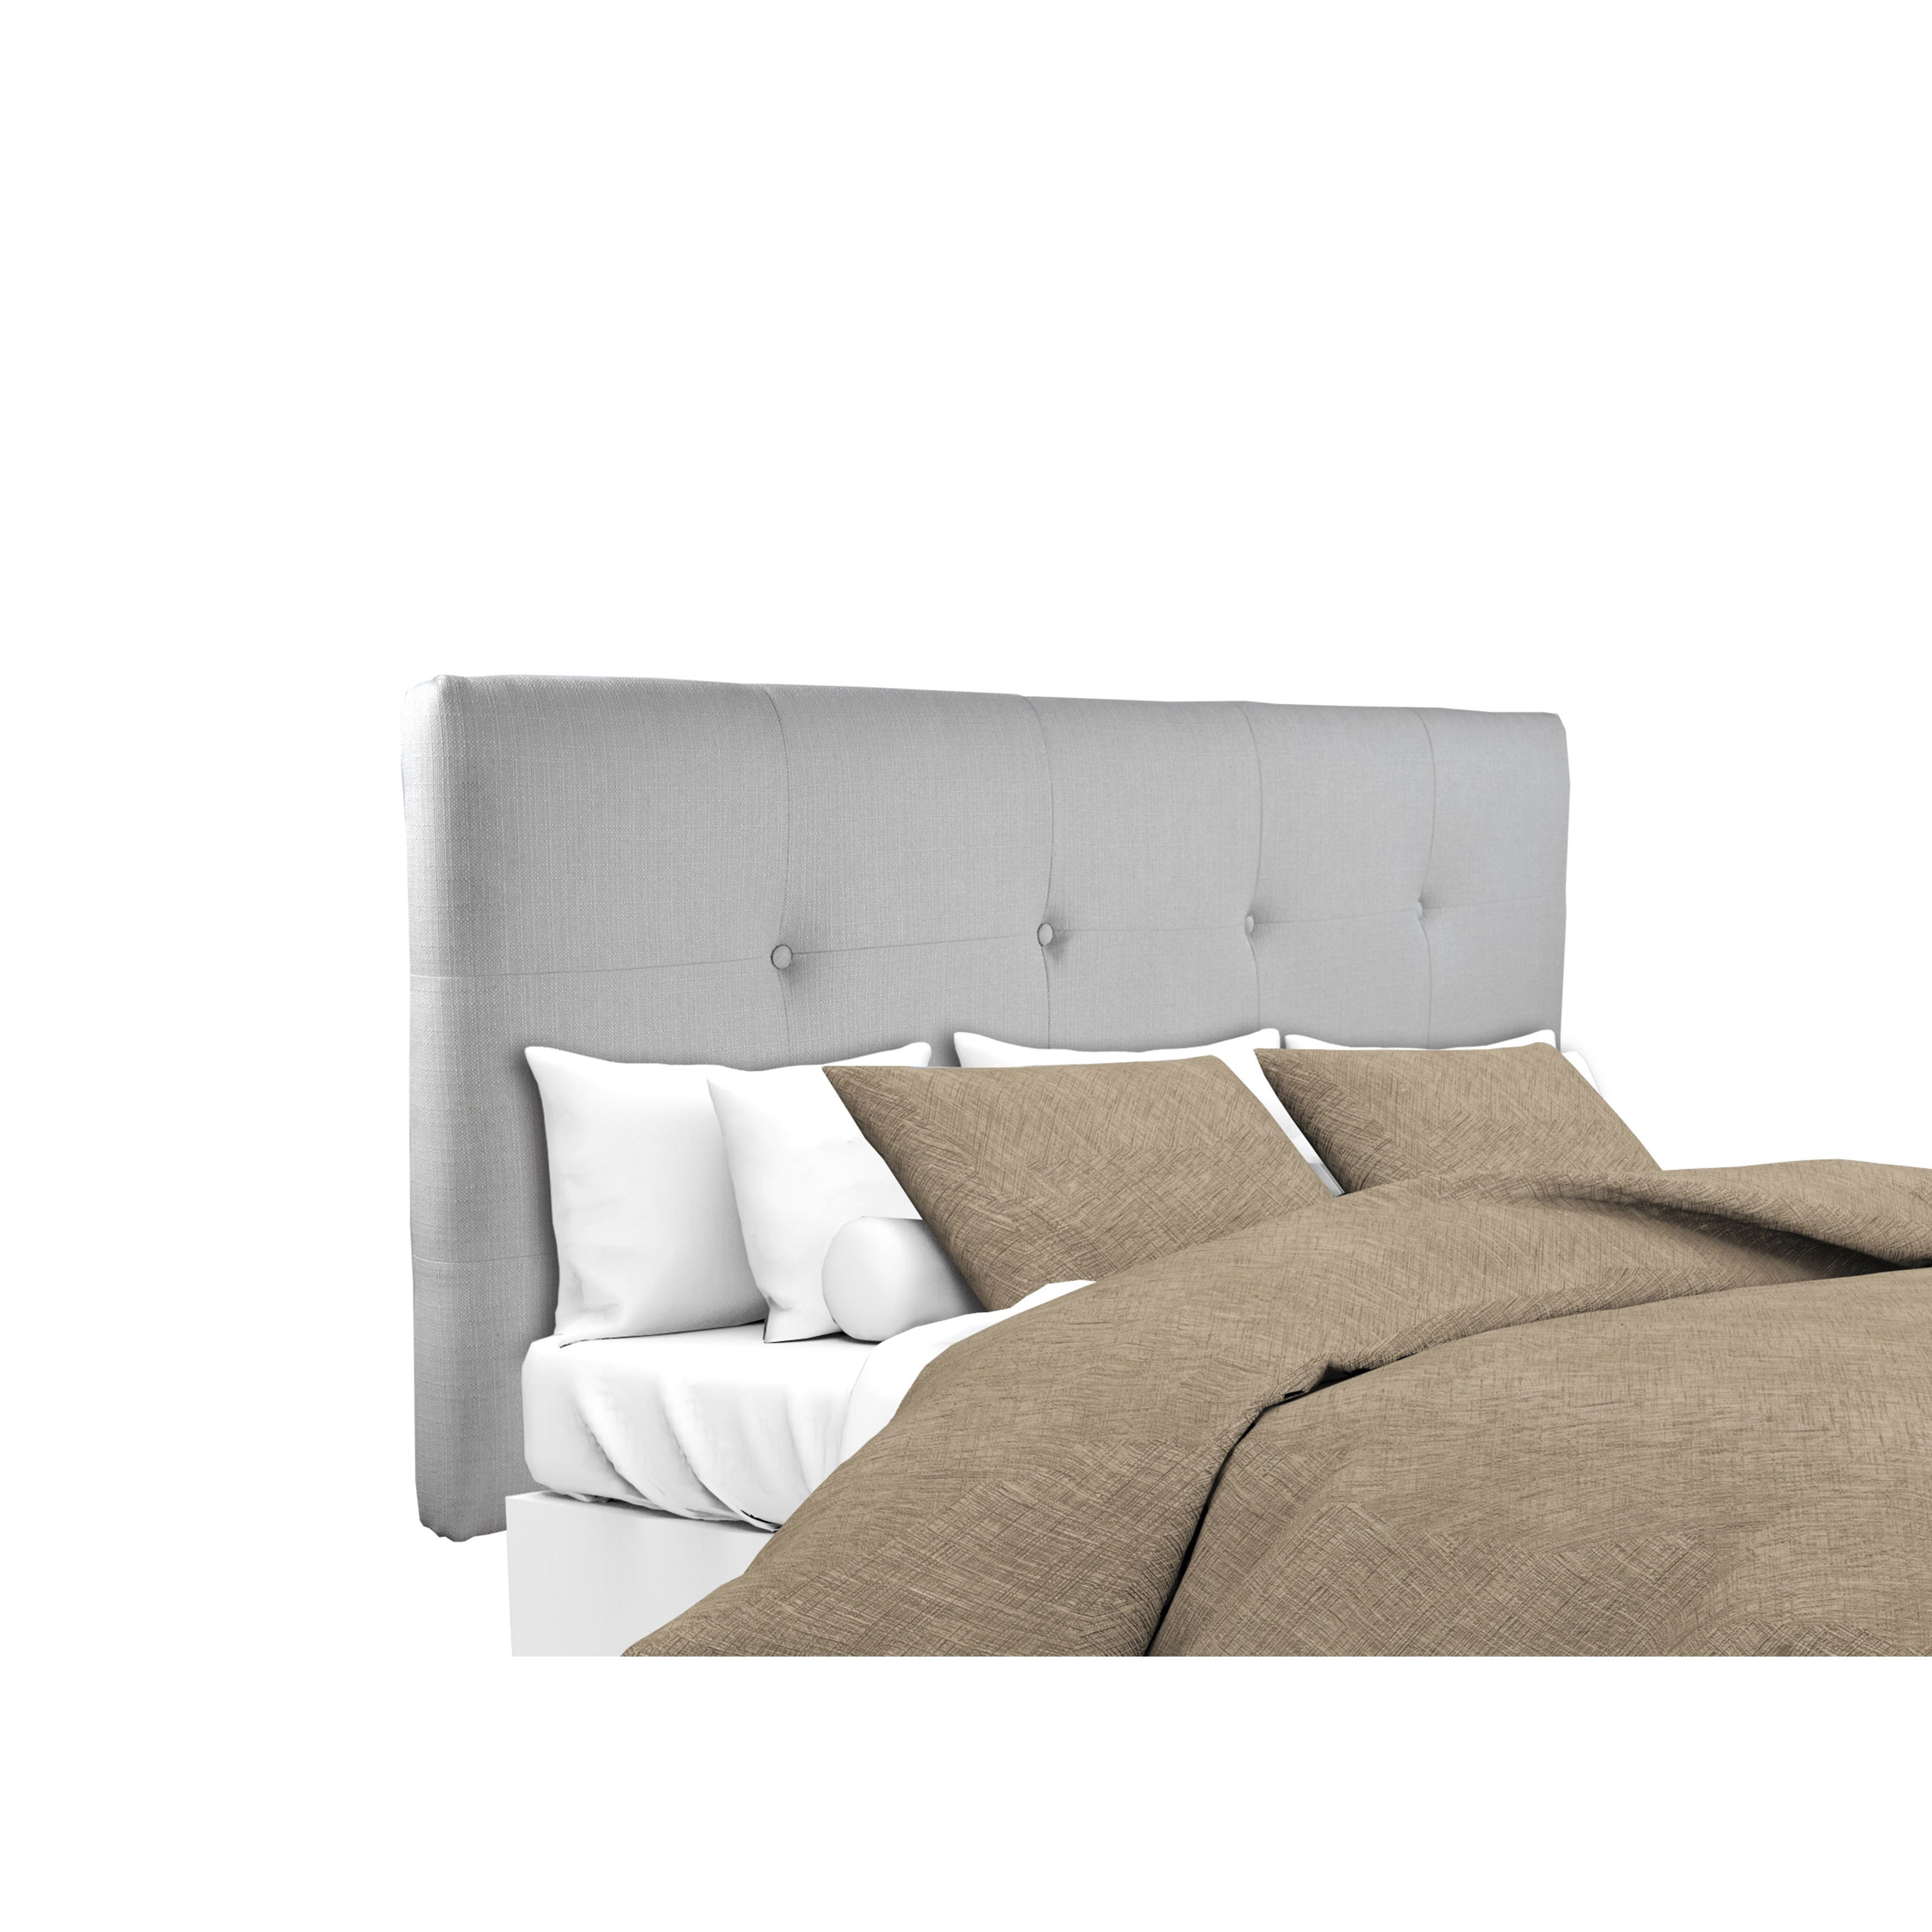 MJL Furniture Ali Button Tufted Silver Grey Upholstered Headboard ...